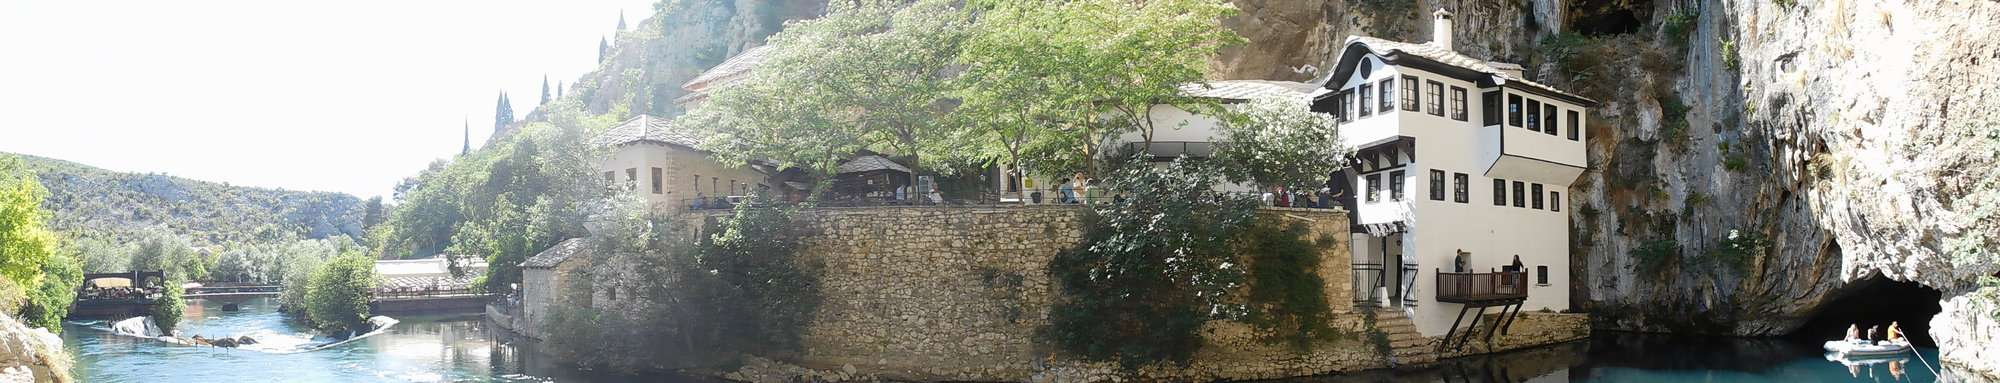 Blagaj – panorama, dervish cloister and Bruna river spring